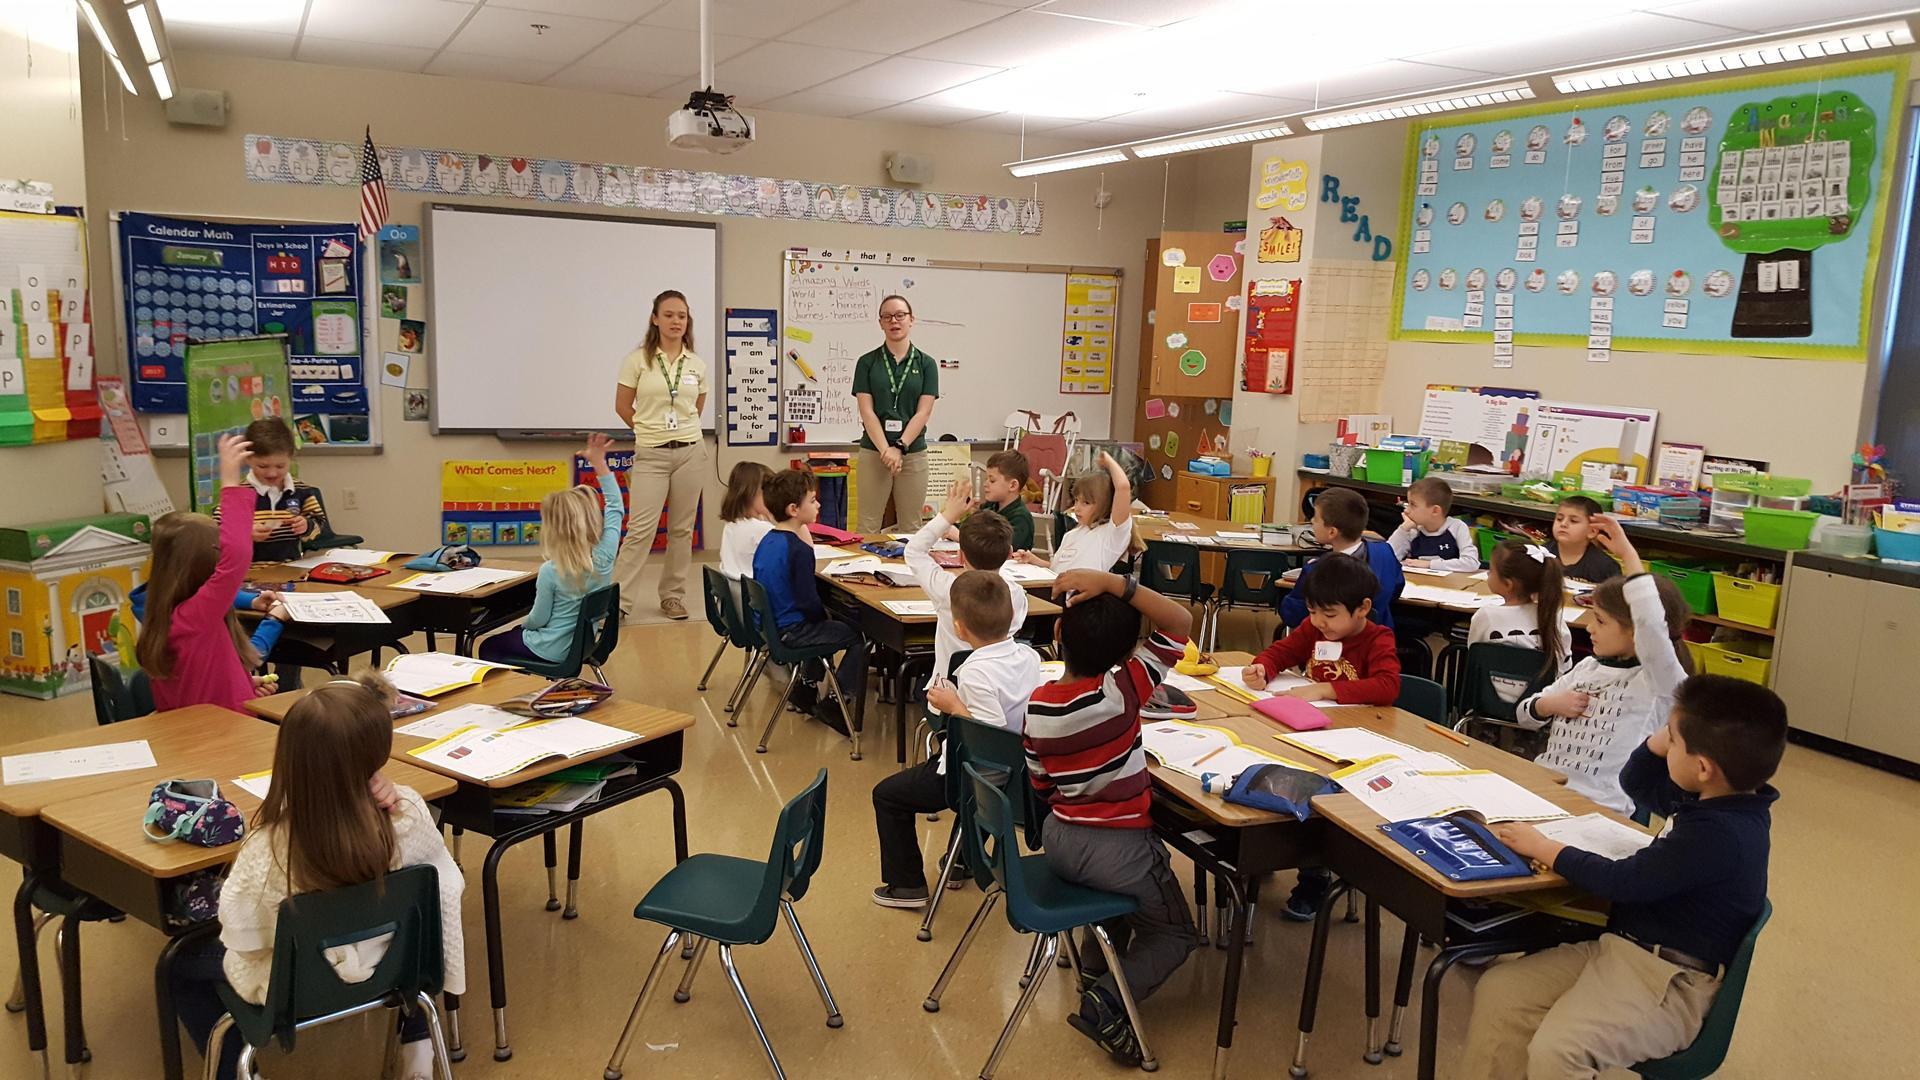 SLS students teach Junior Achievement curriculum to grade school students